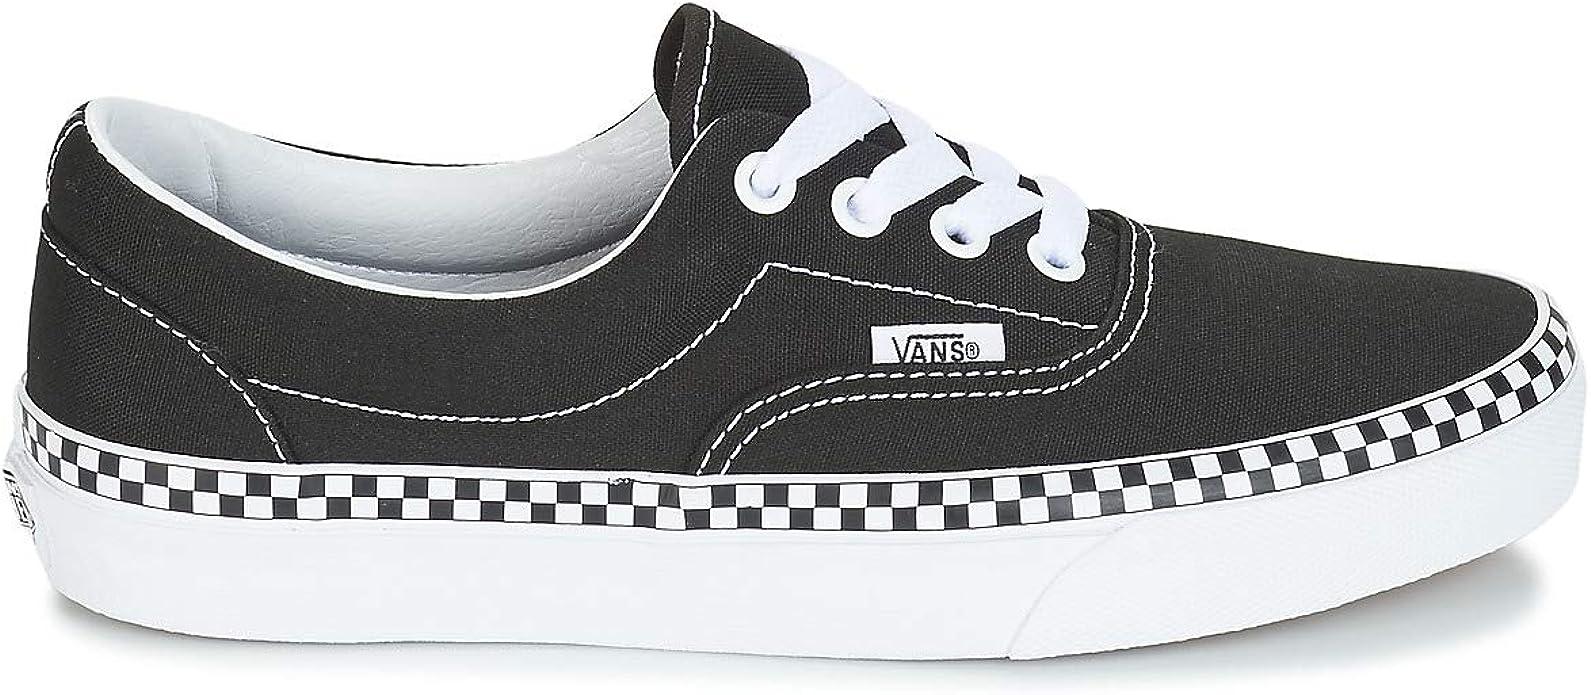 Vans Era (Check Foxing) Schuhe Damen Schwarz: